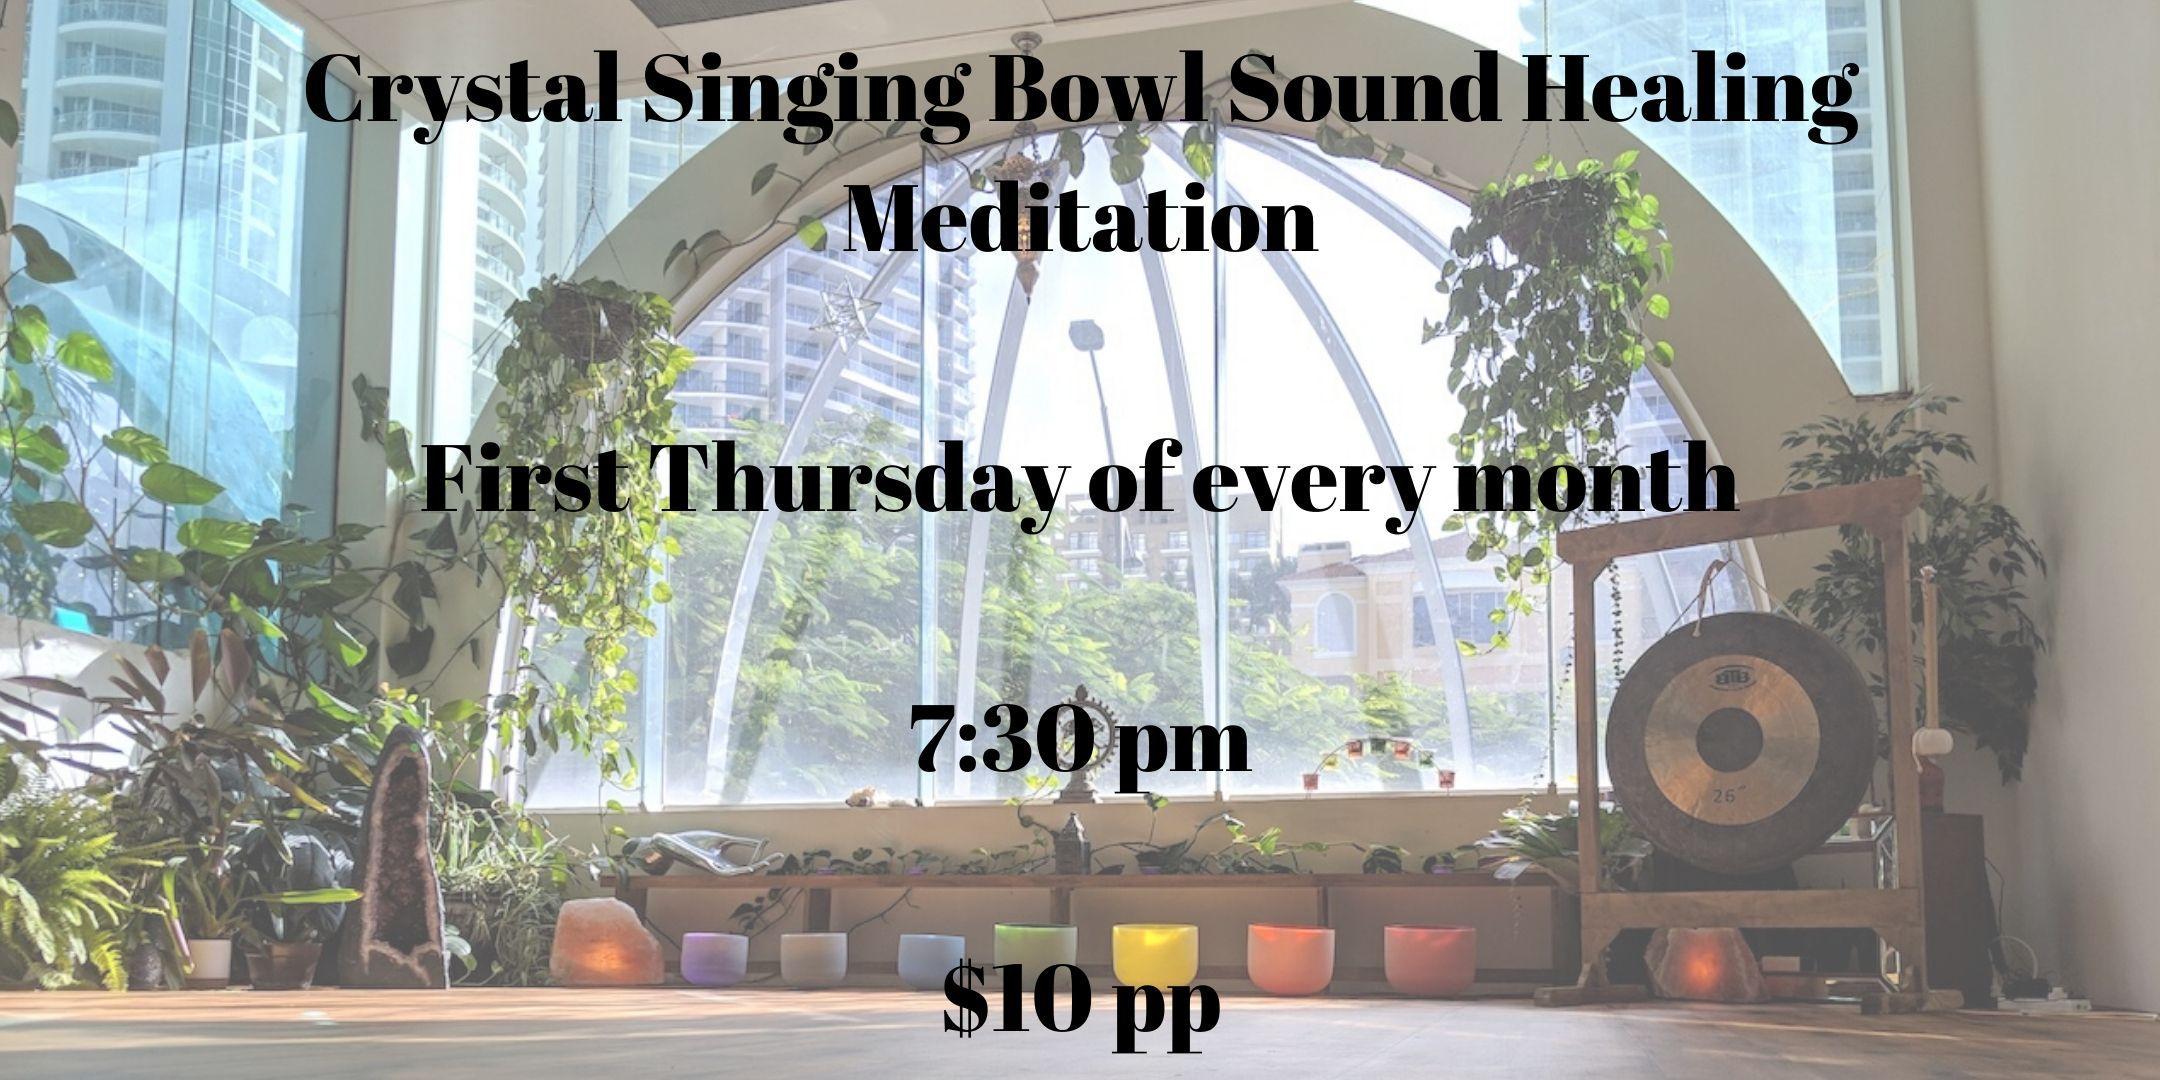 Crystal Singing Bowl Sound Healing Meditation